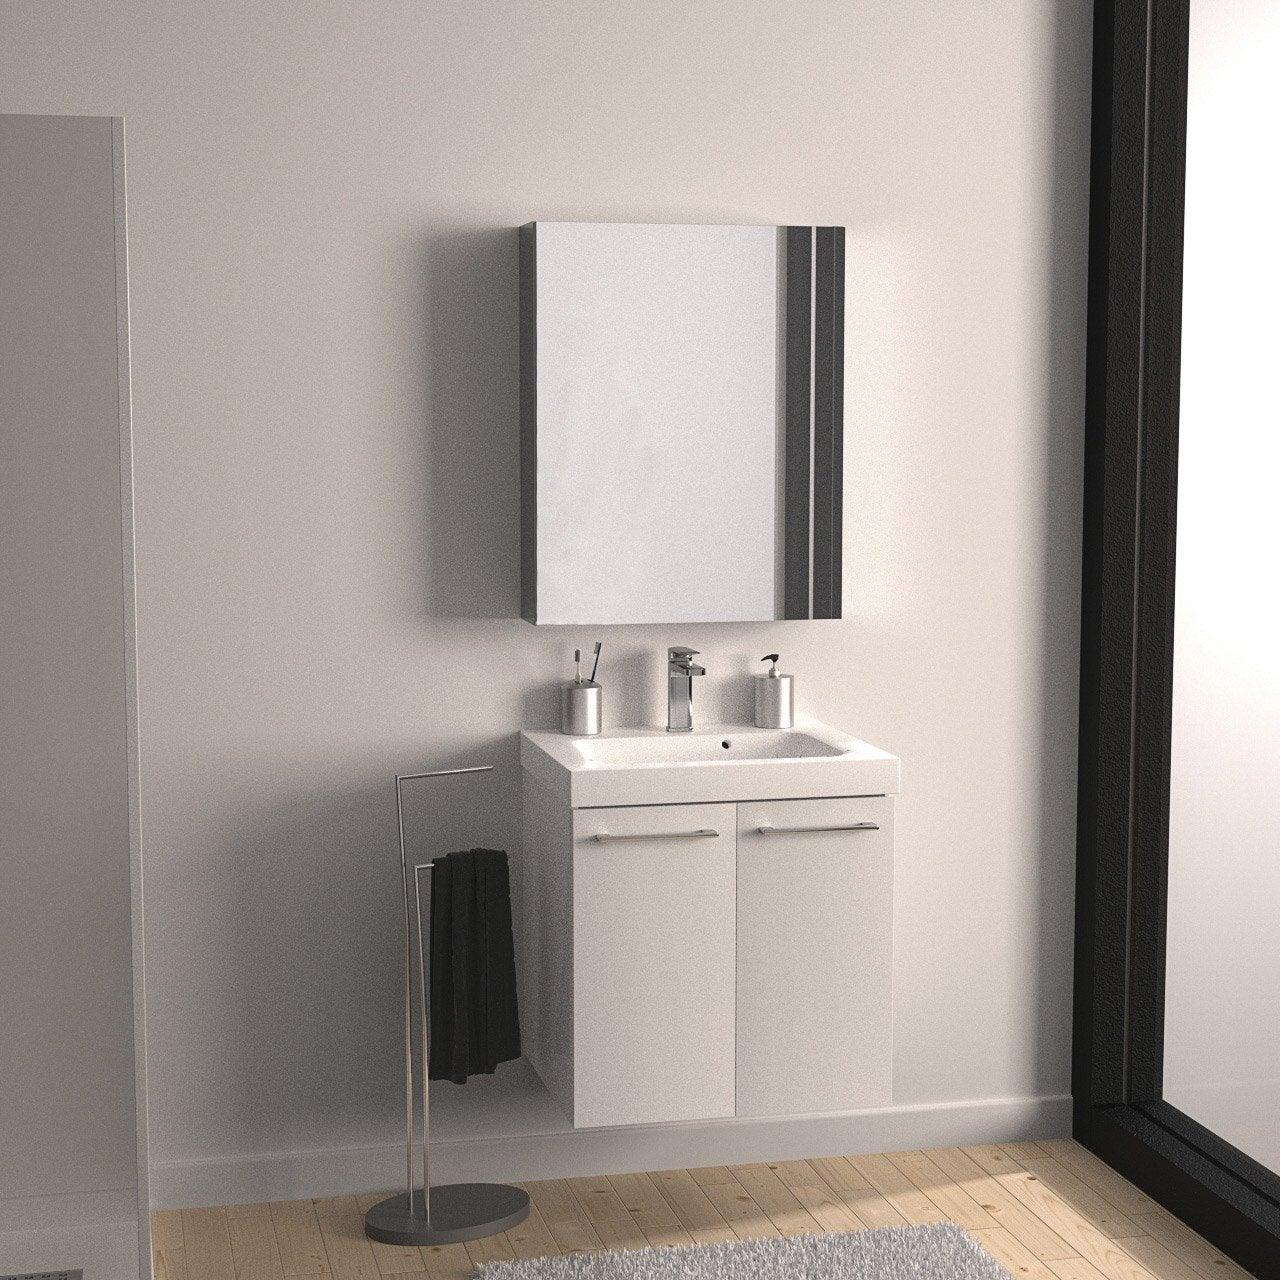 meuble vasque 61 cm d cor imitation ch ne clair remix leroy merlin. Black Bedroom Furniture Sets. Home Design Ideas